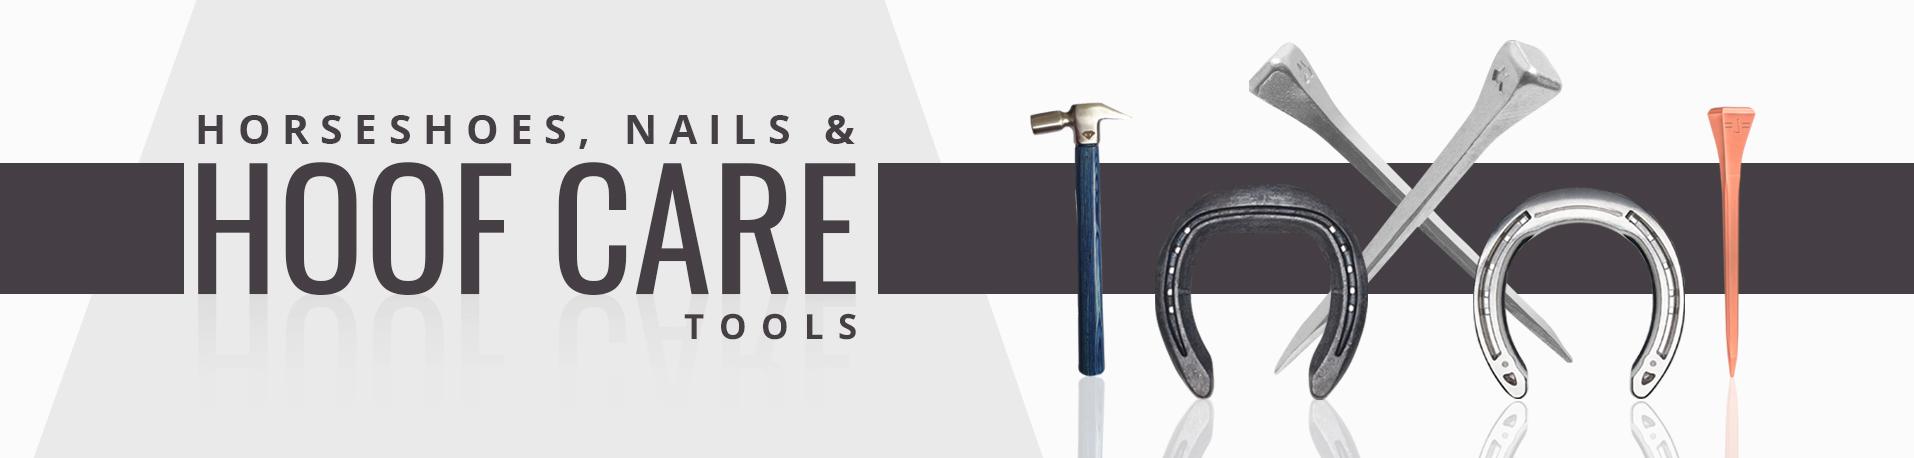 Farrier Tools Supplies